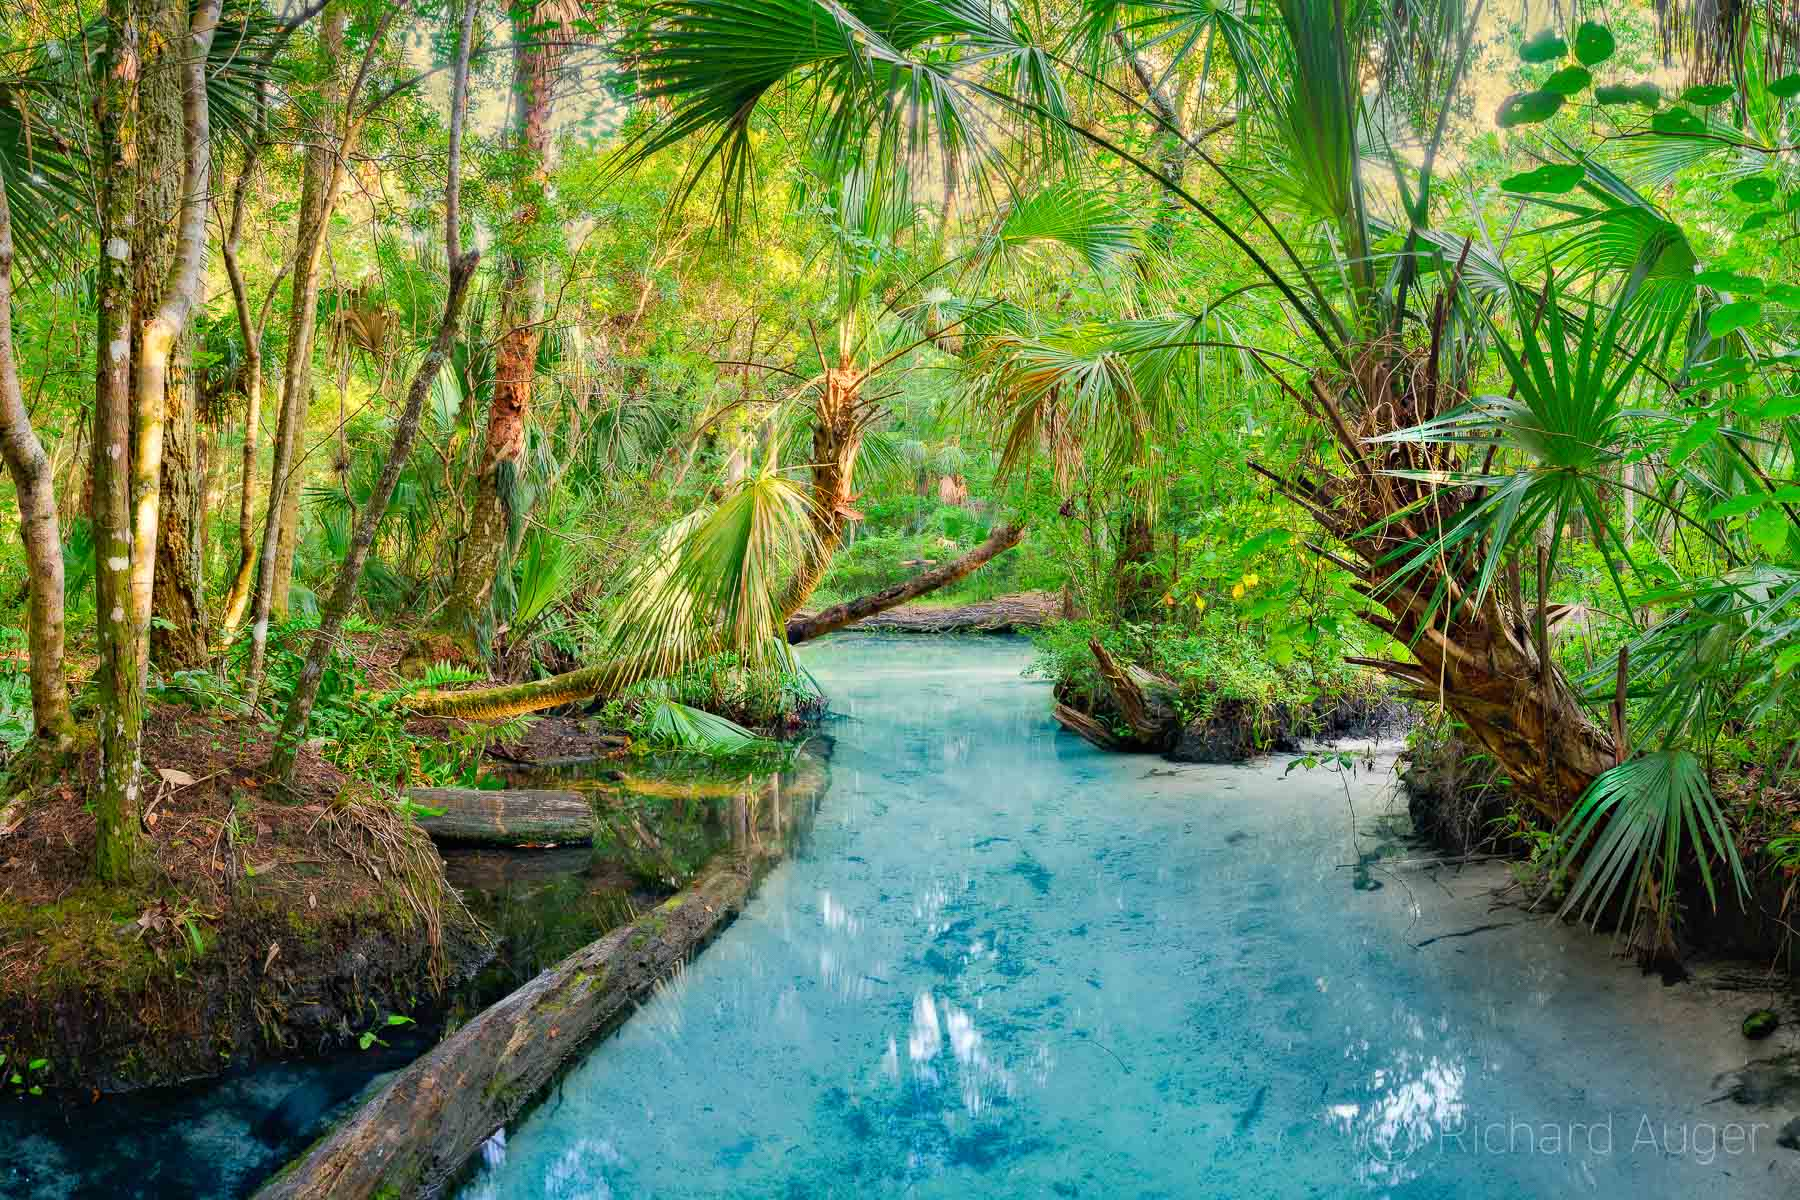 Chassahowitzka River, Baird Creek, Florida, Spring, kayaking, palm trees, nature, photograph, photo, photographer, landscape